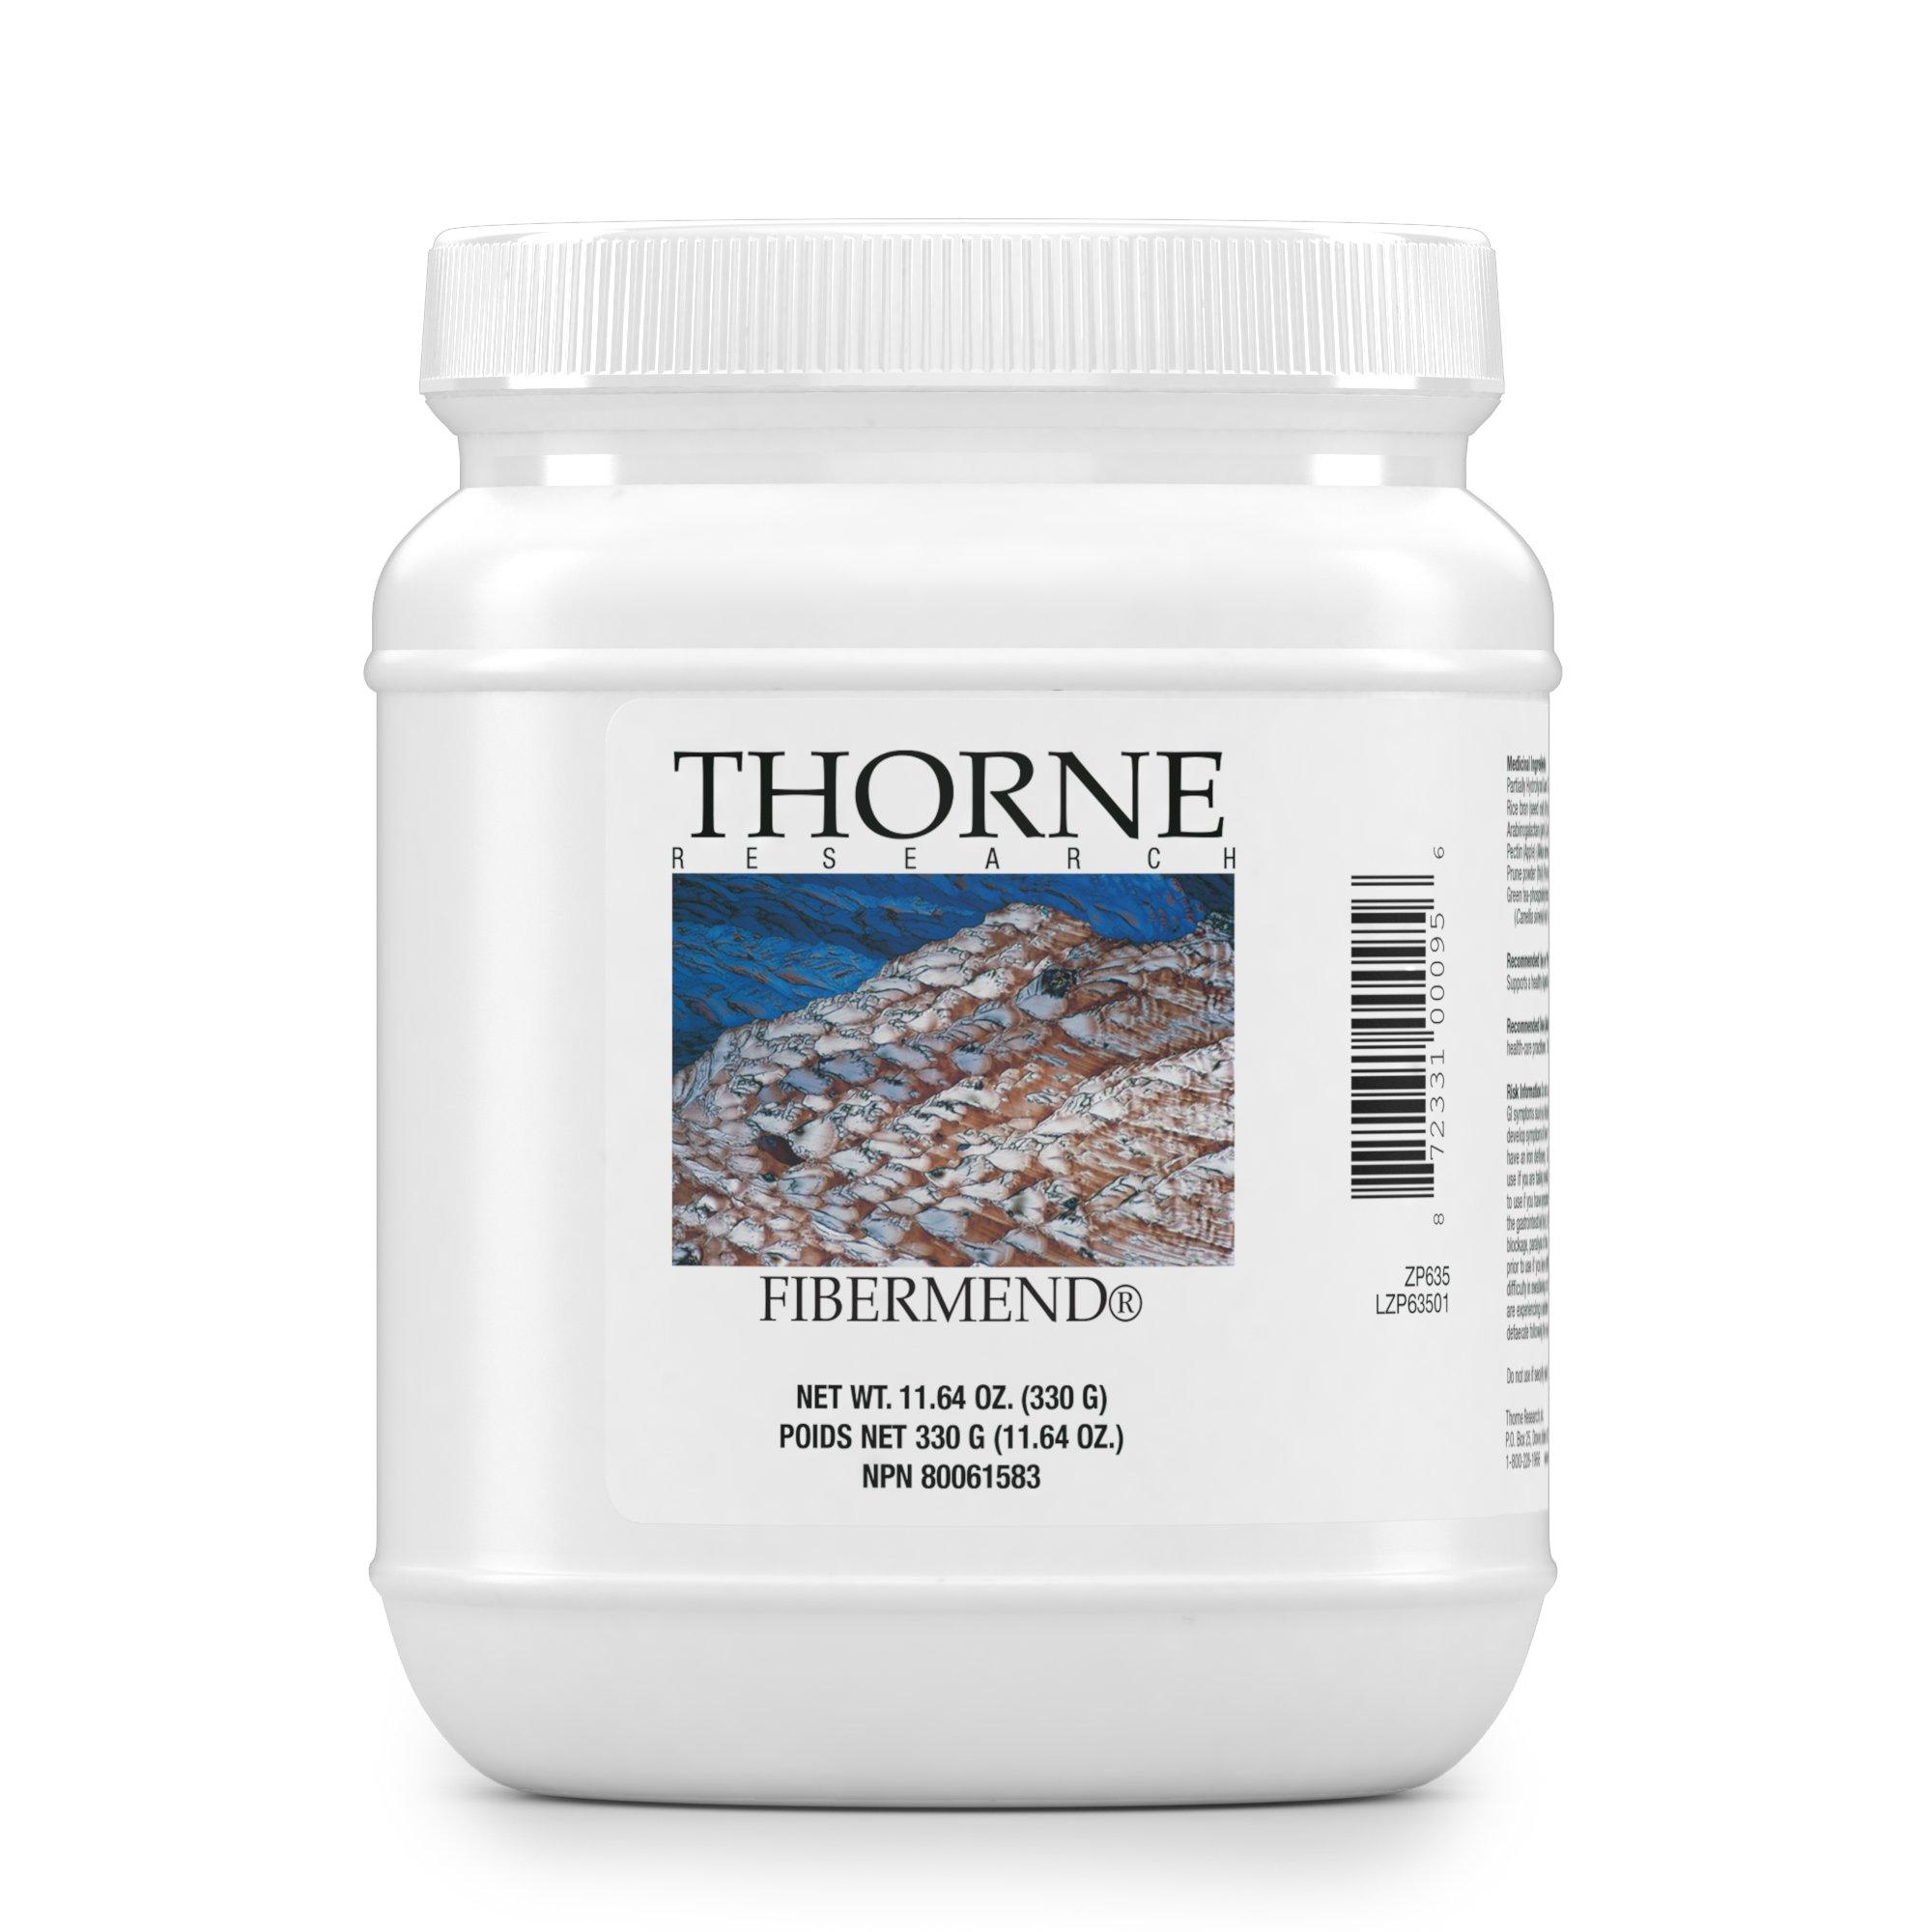 Thorne Research - FiberMend - Prebiotic Fiber Powder to Help Maintain Regularity and Balanced GI Flora - 11.6 oz.